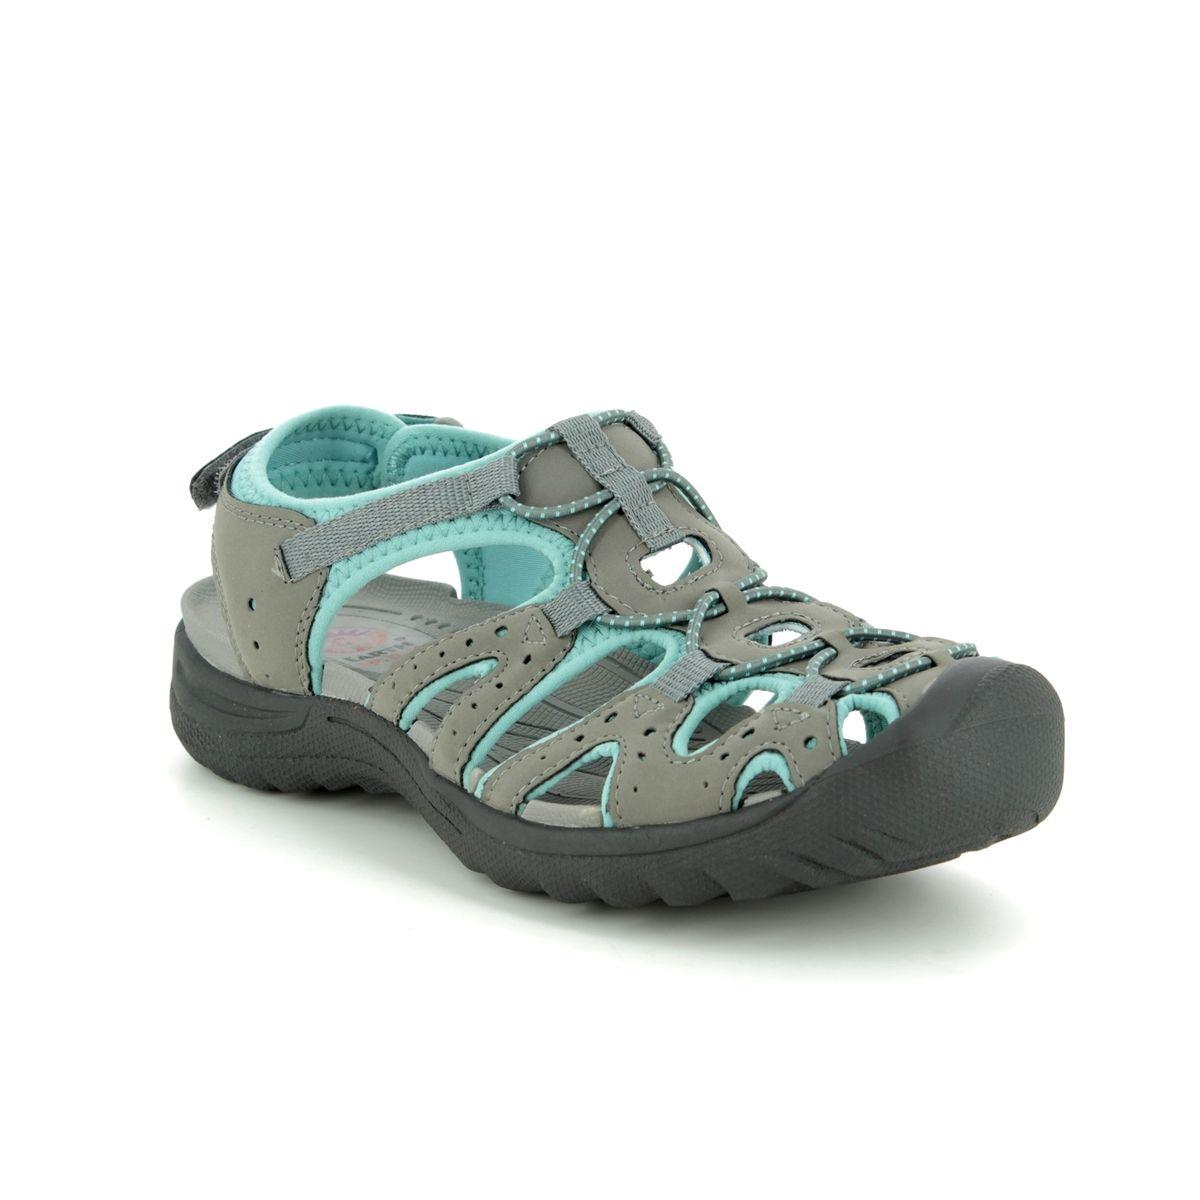 e2a64e983 Earth Spirit Closed Toe Sandals - Grey multi - 30259 00 MIDWAY